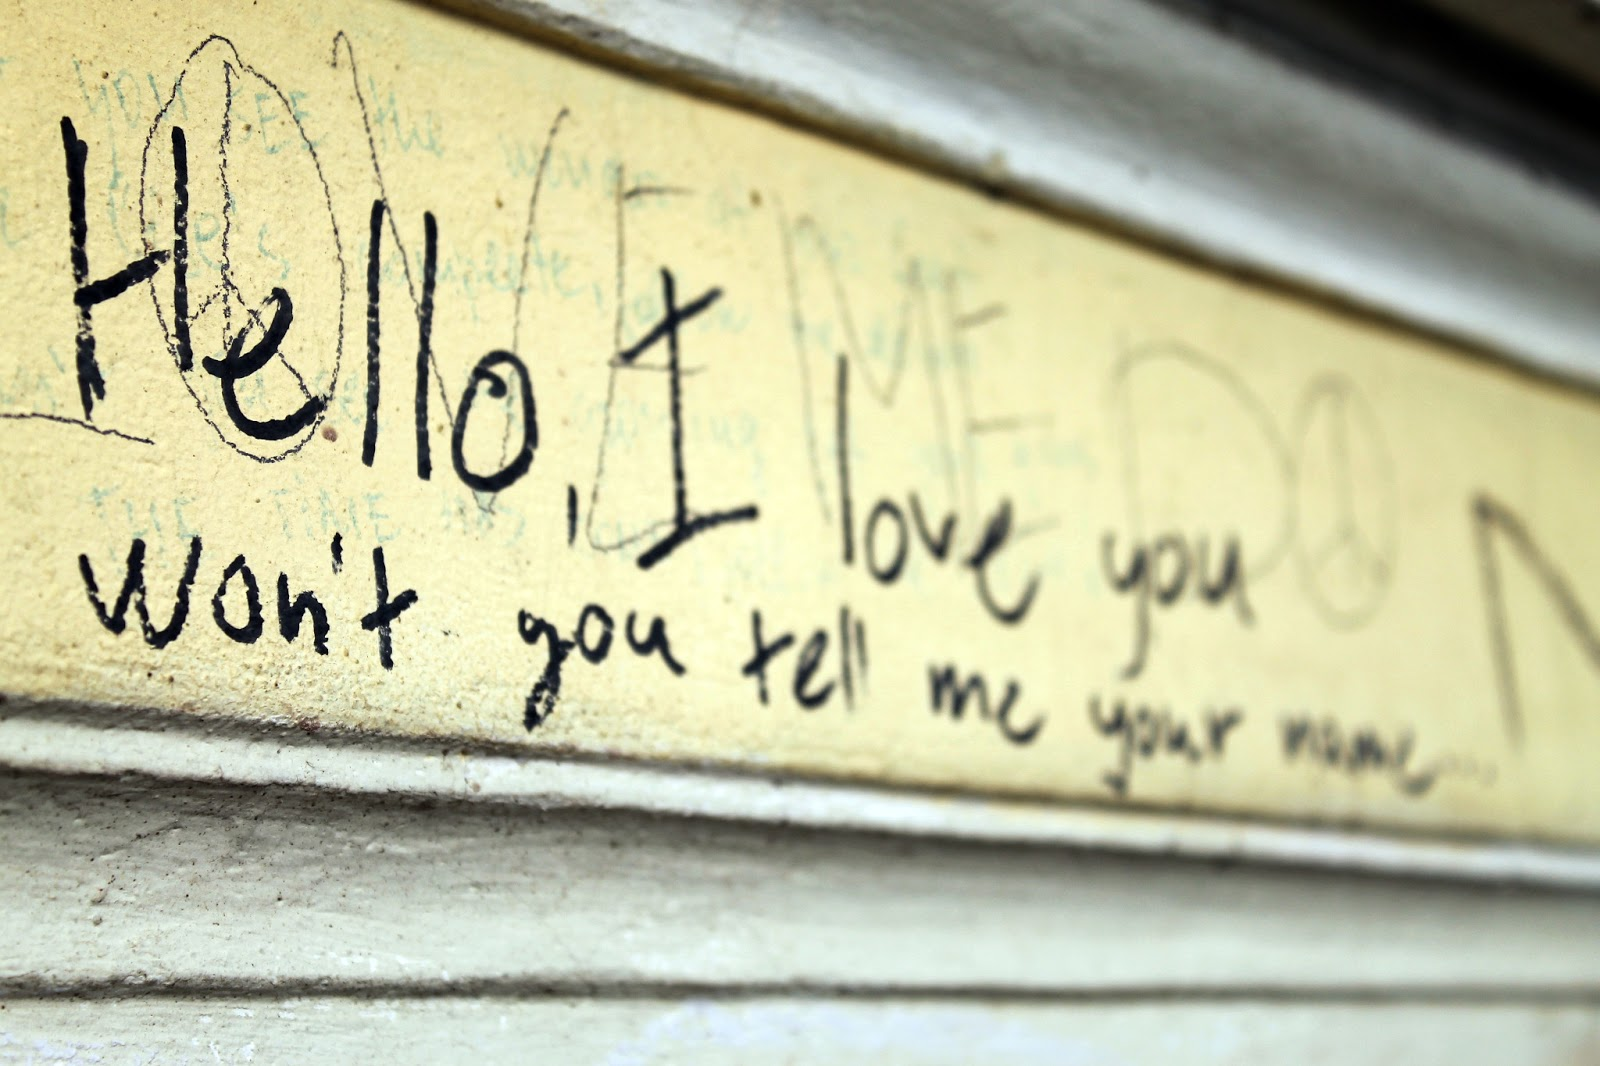 THIS BLOG WAS WRIT IN WATER: John Lennon Wall, Sofia, Bulgaria